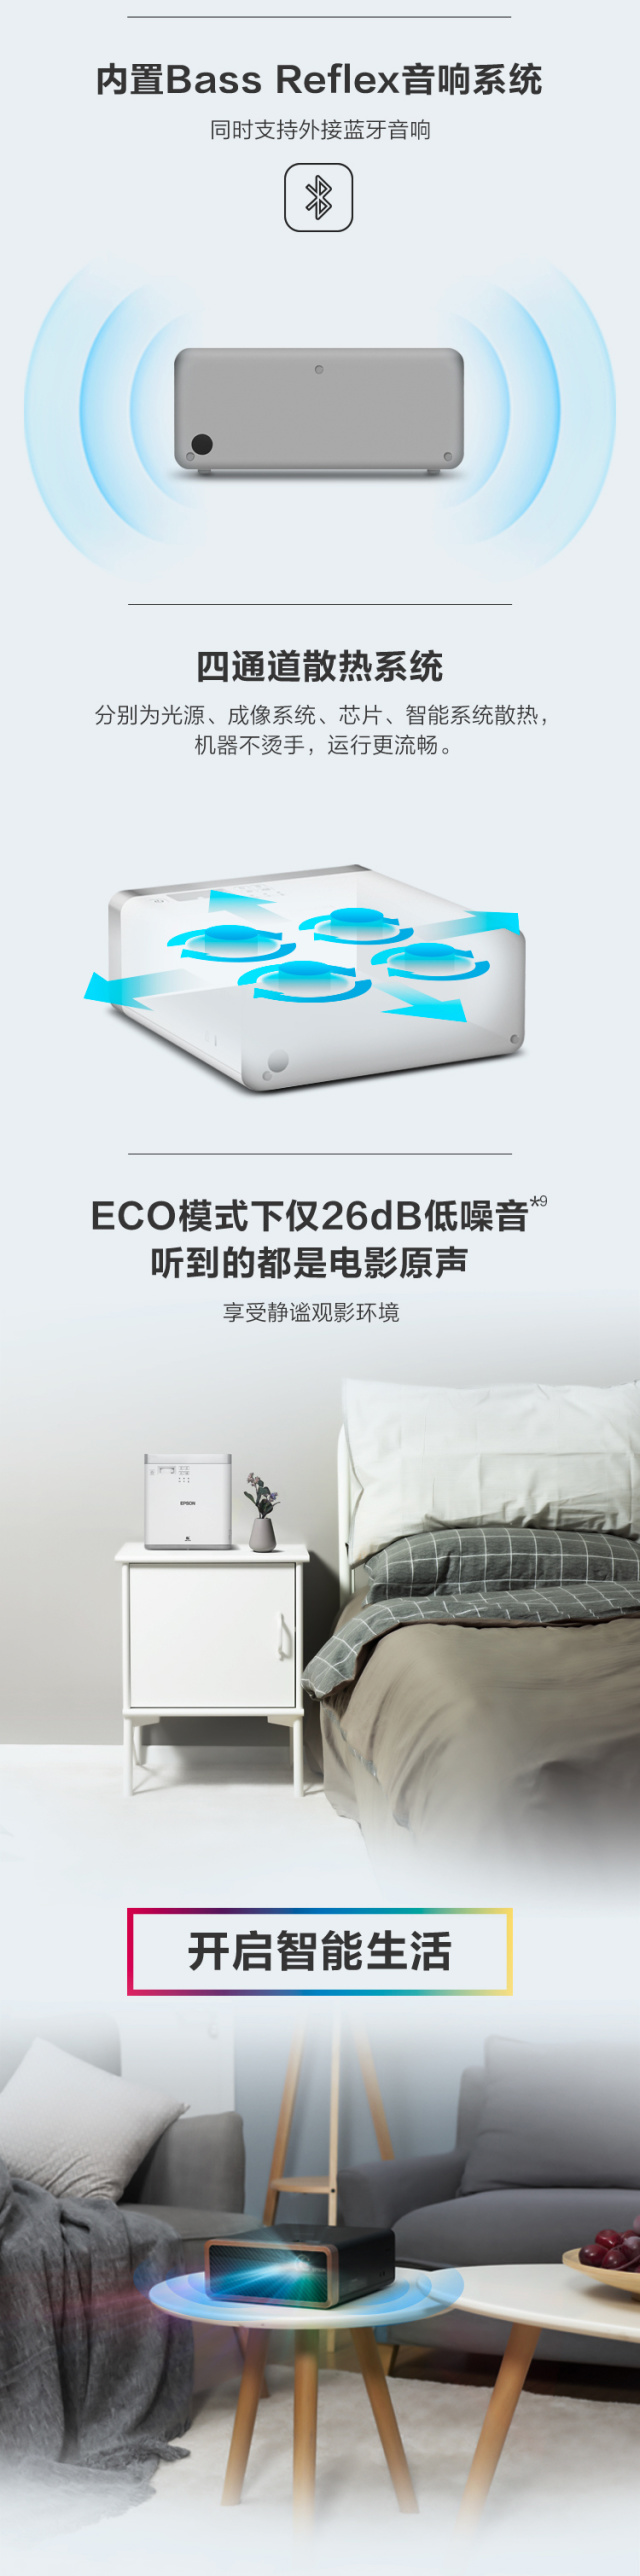 愛普生(Epson)3LCD智能投影機